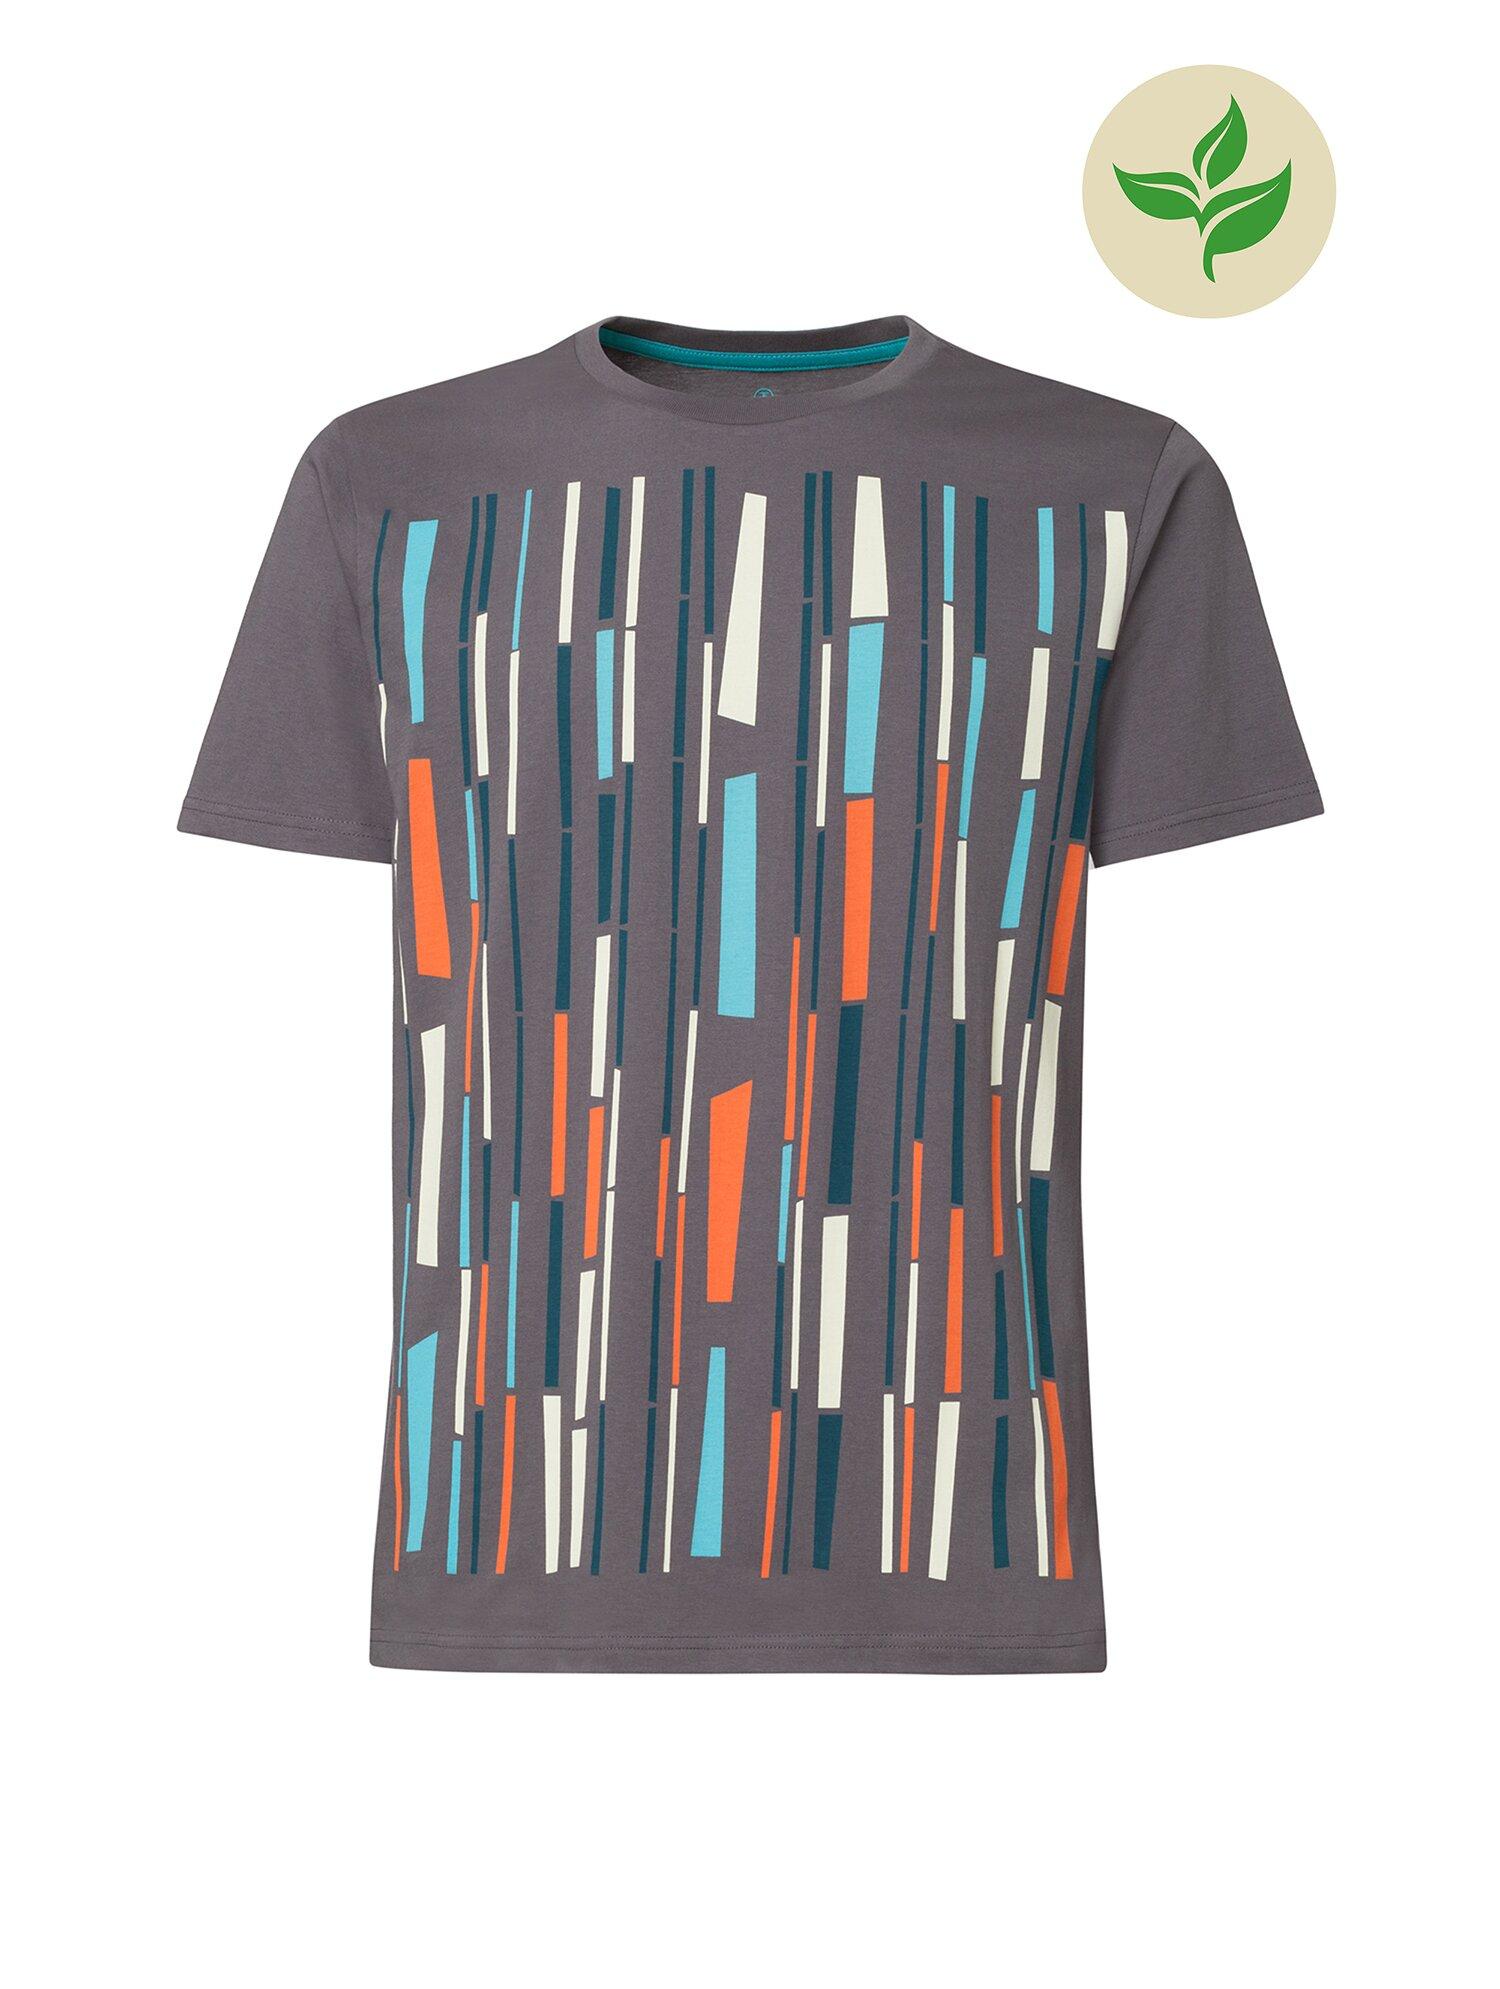 Fairtrade Trade Print Herren Müller ShirtCastlerock T qSUzpVM